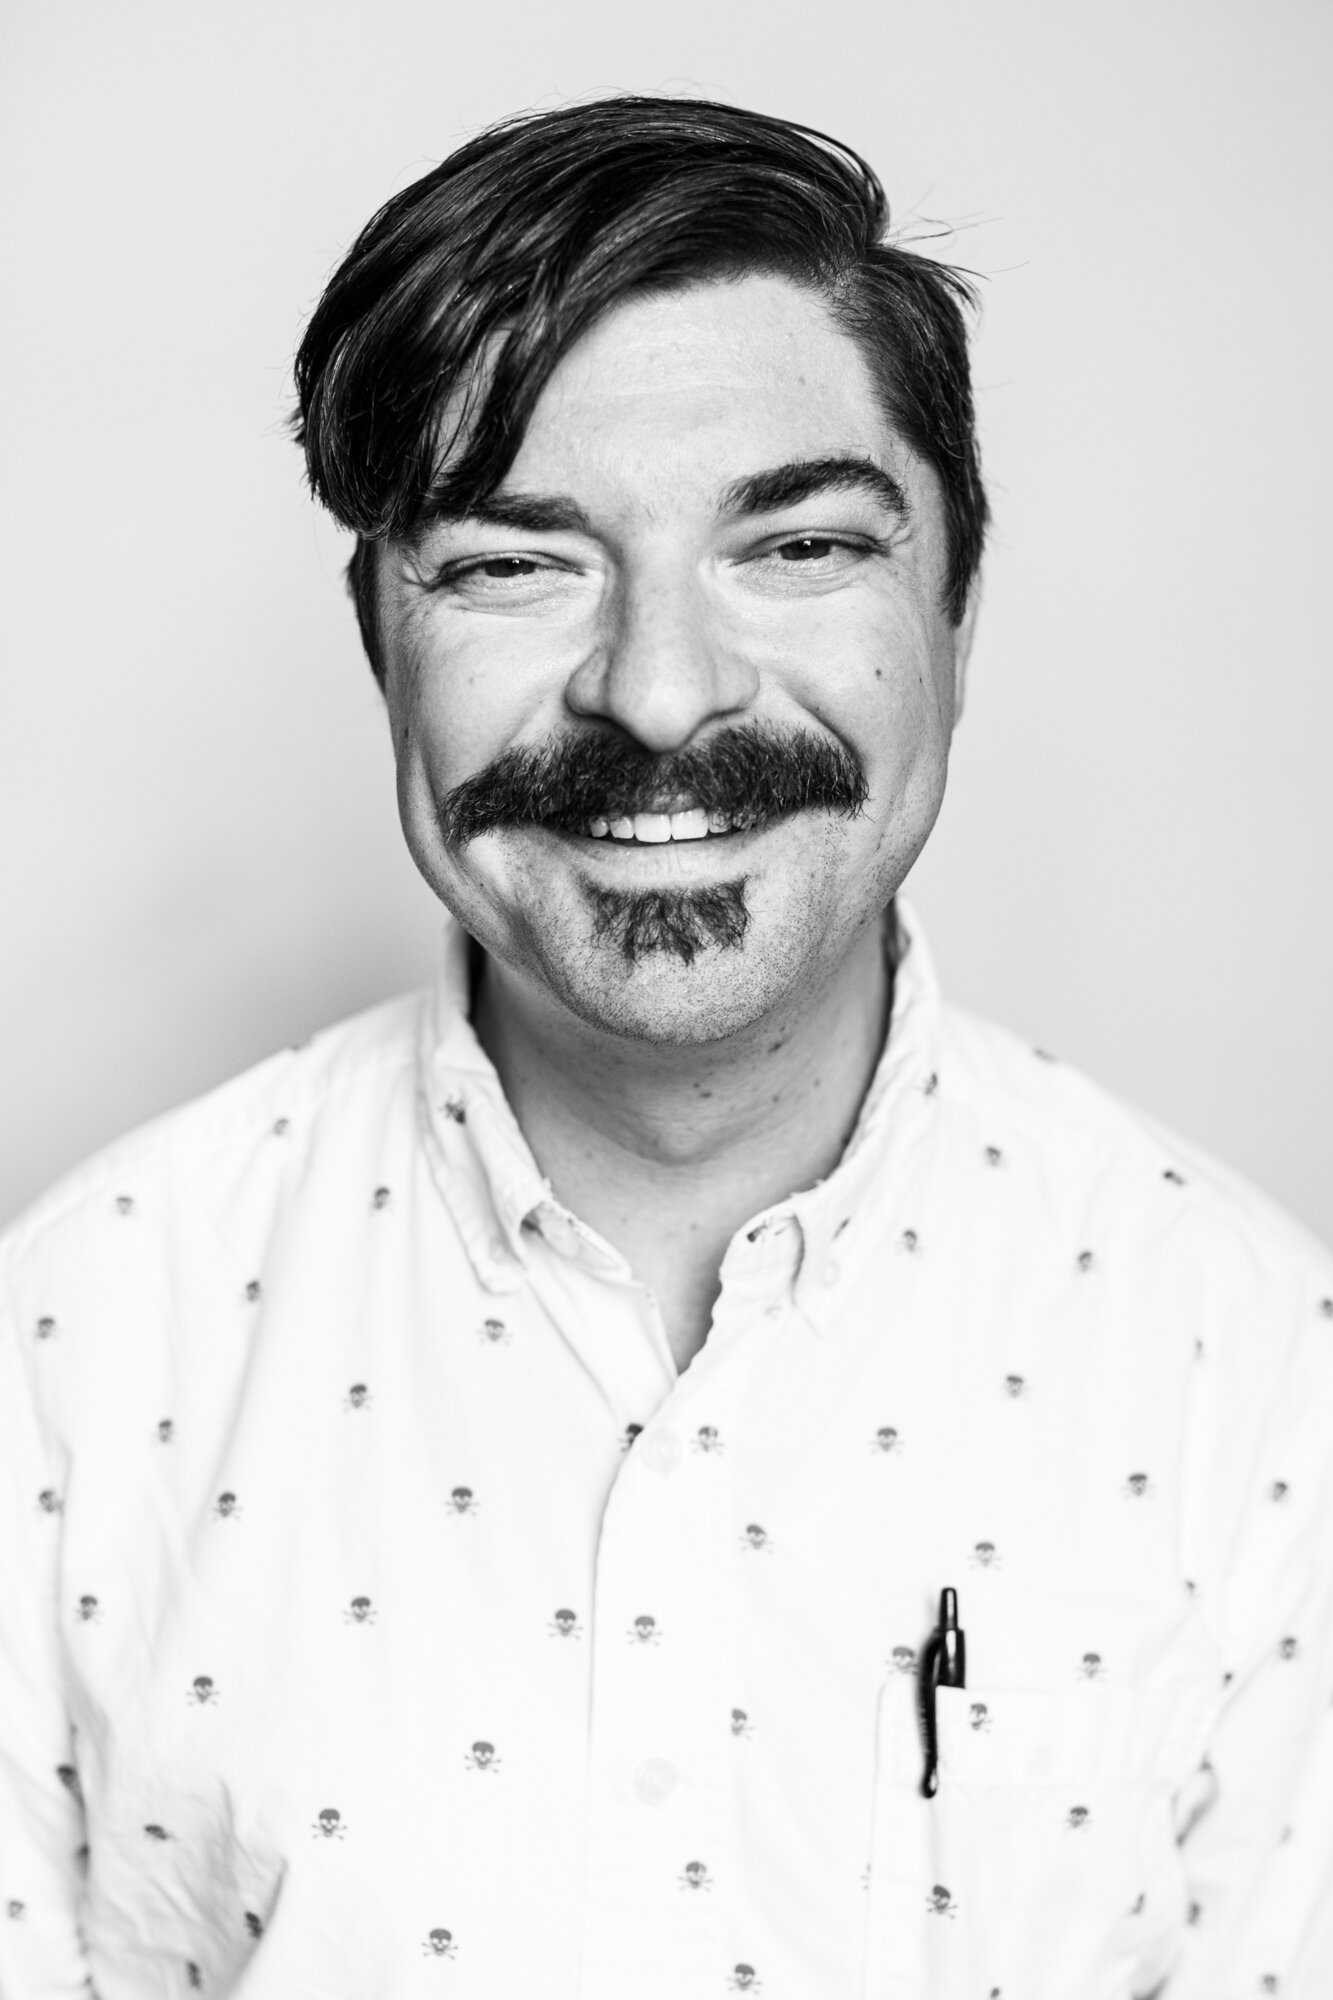 Jason Hitchcock | Architect + Project Manager